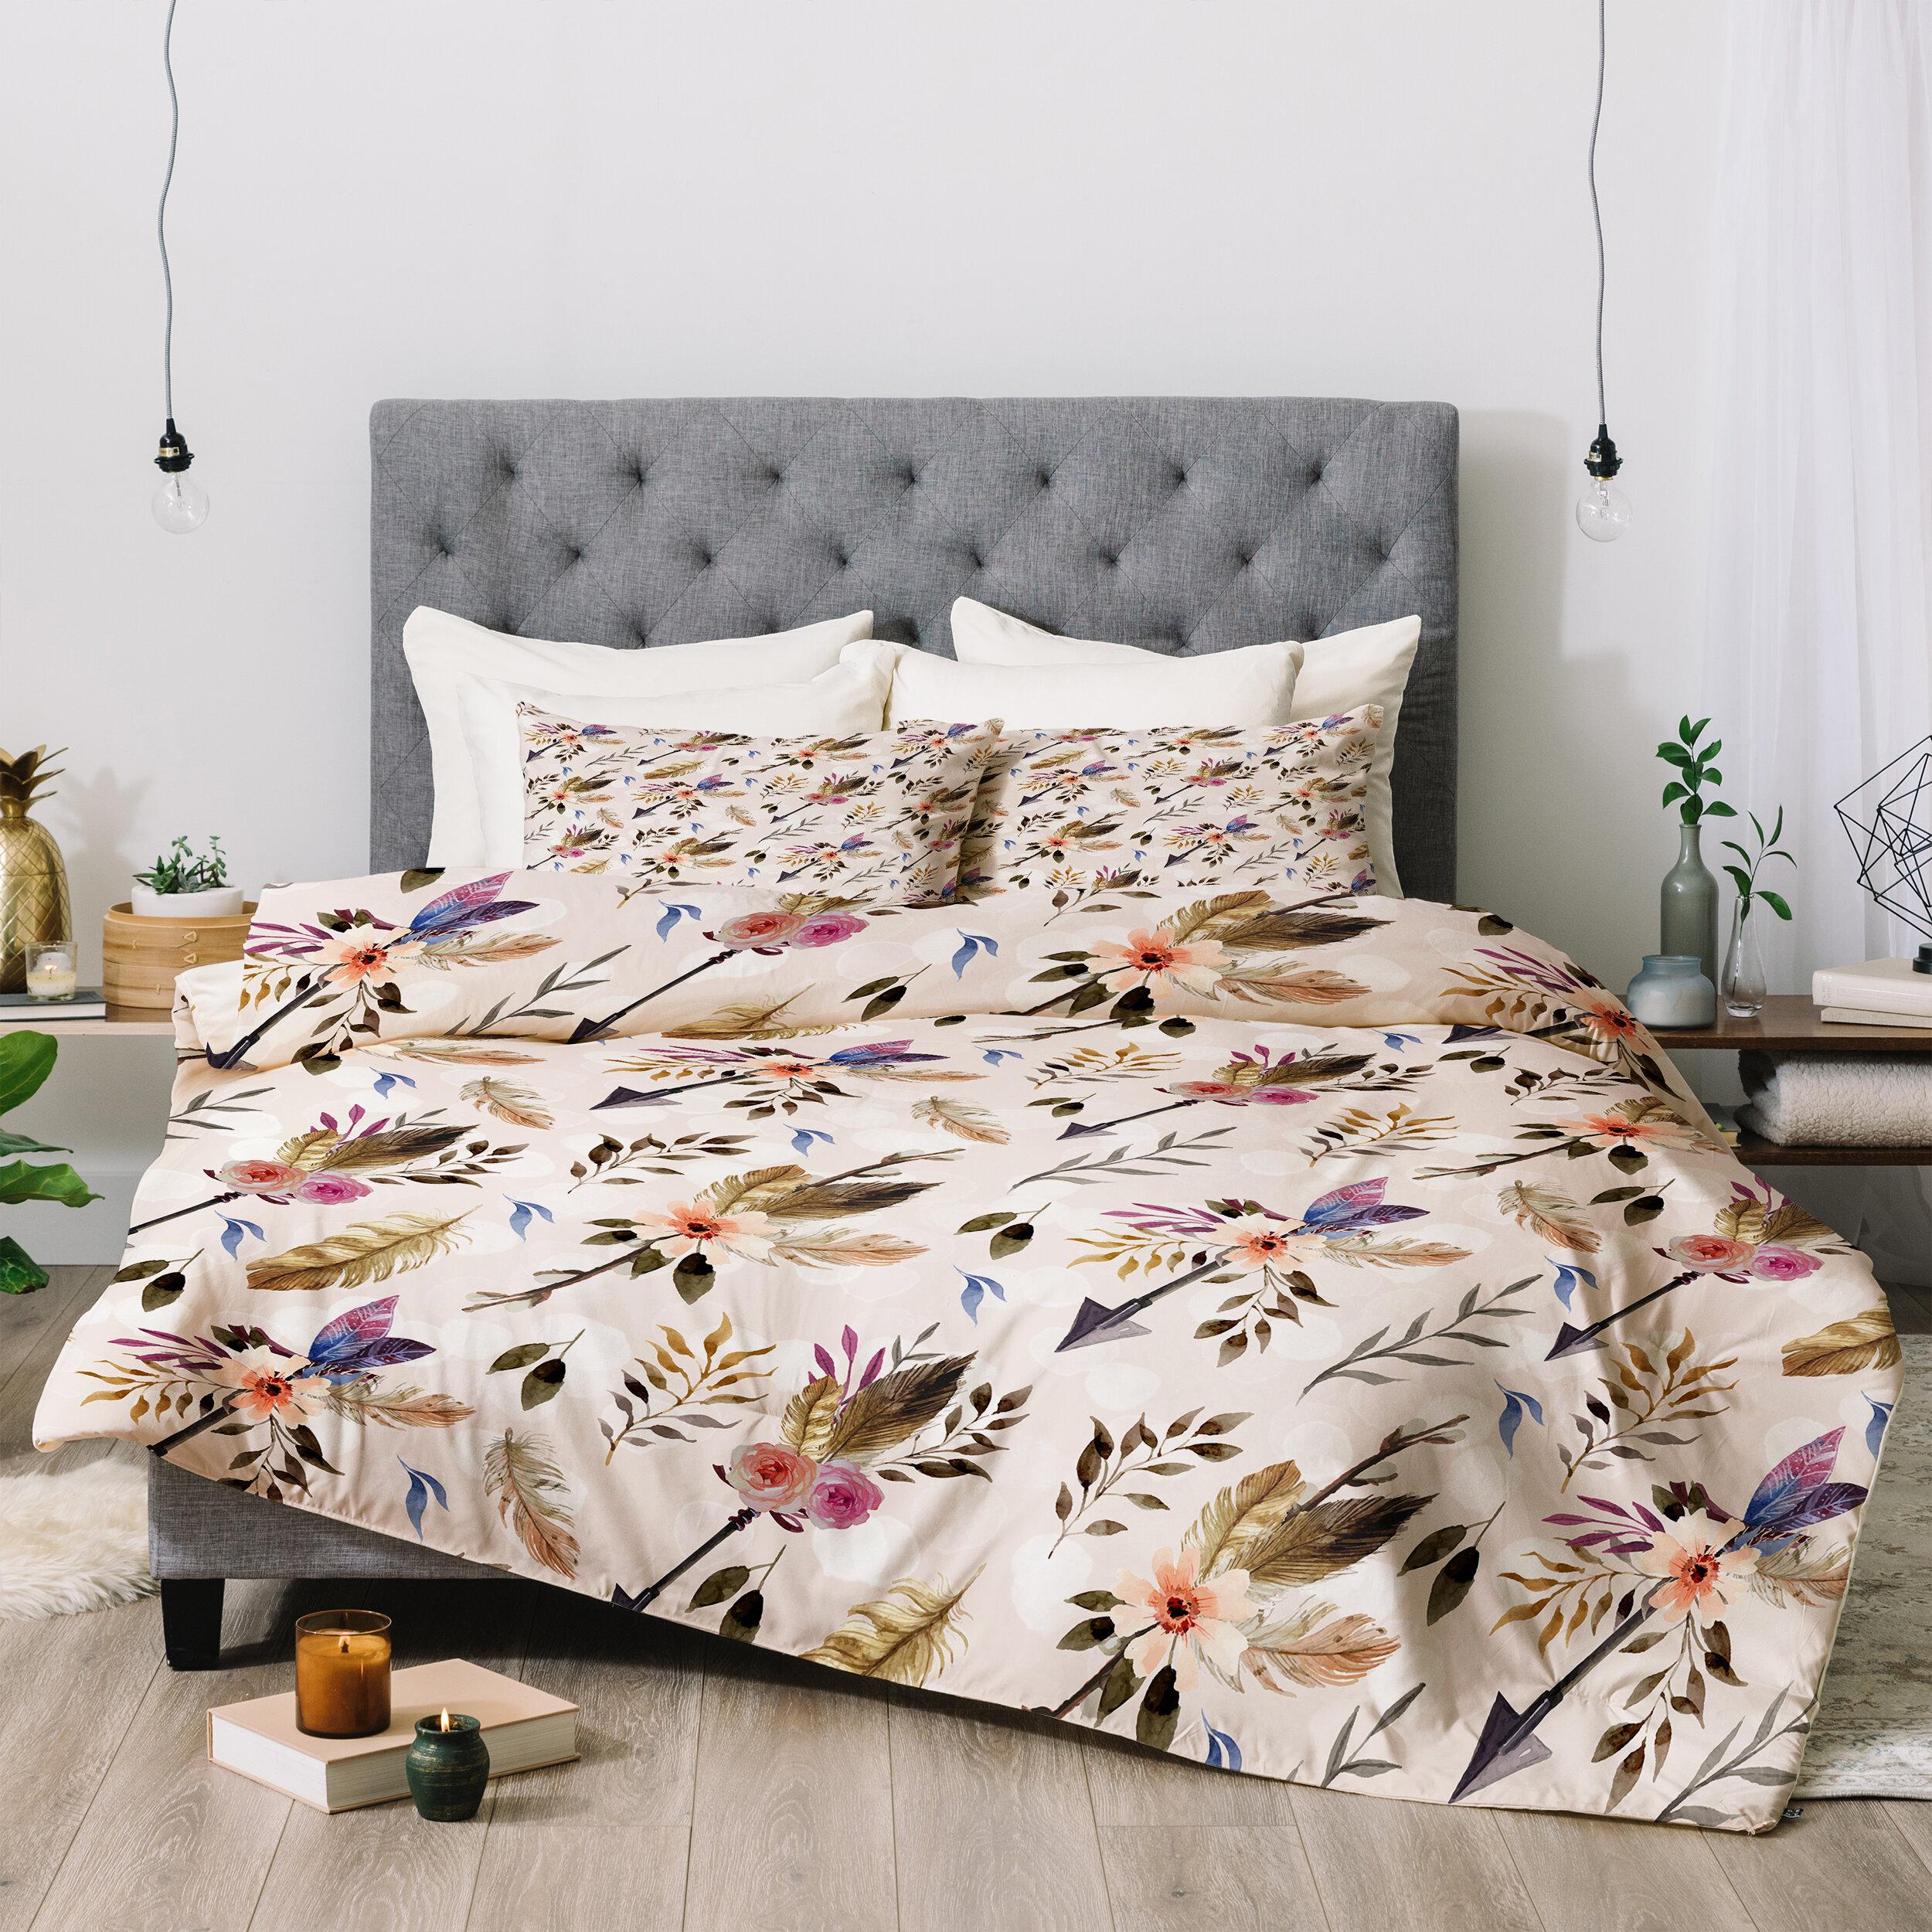 East Urban Home Marta Barragan Camarasa Bohemian Comforter Set Reviews Wayfair